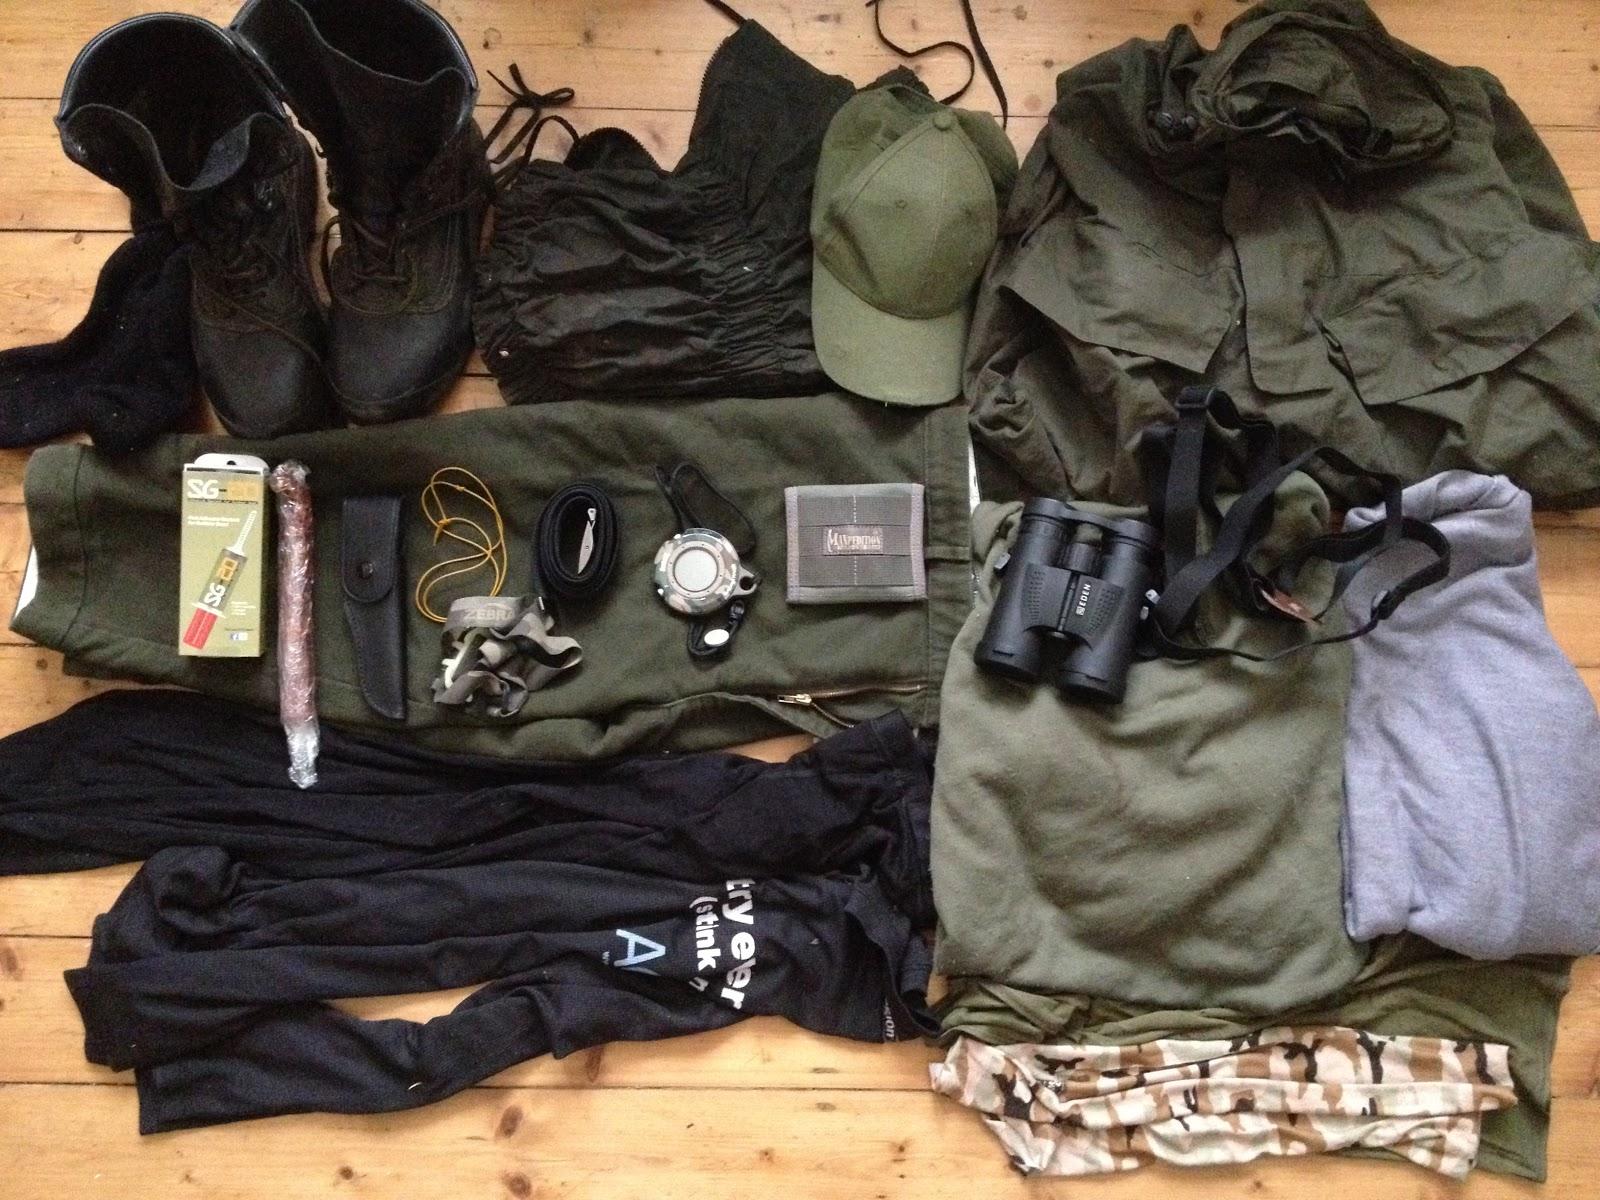 4ddf1d372c57b Gear List: Woodland Deer Stalking |The Suburban Bushwacker: From Fat ...